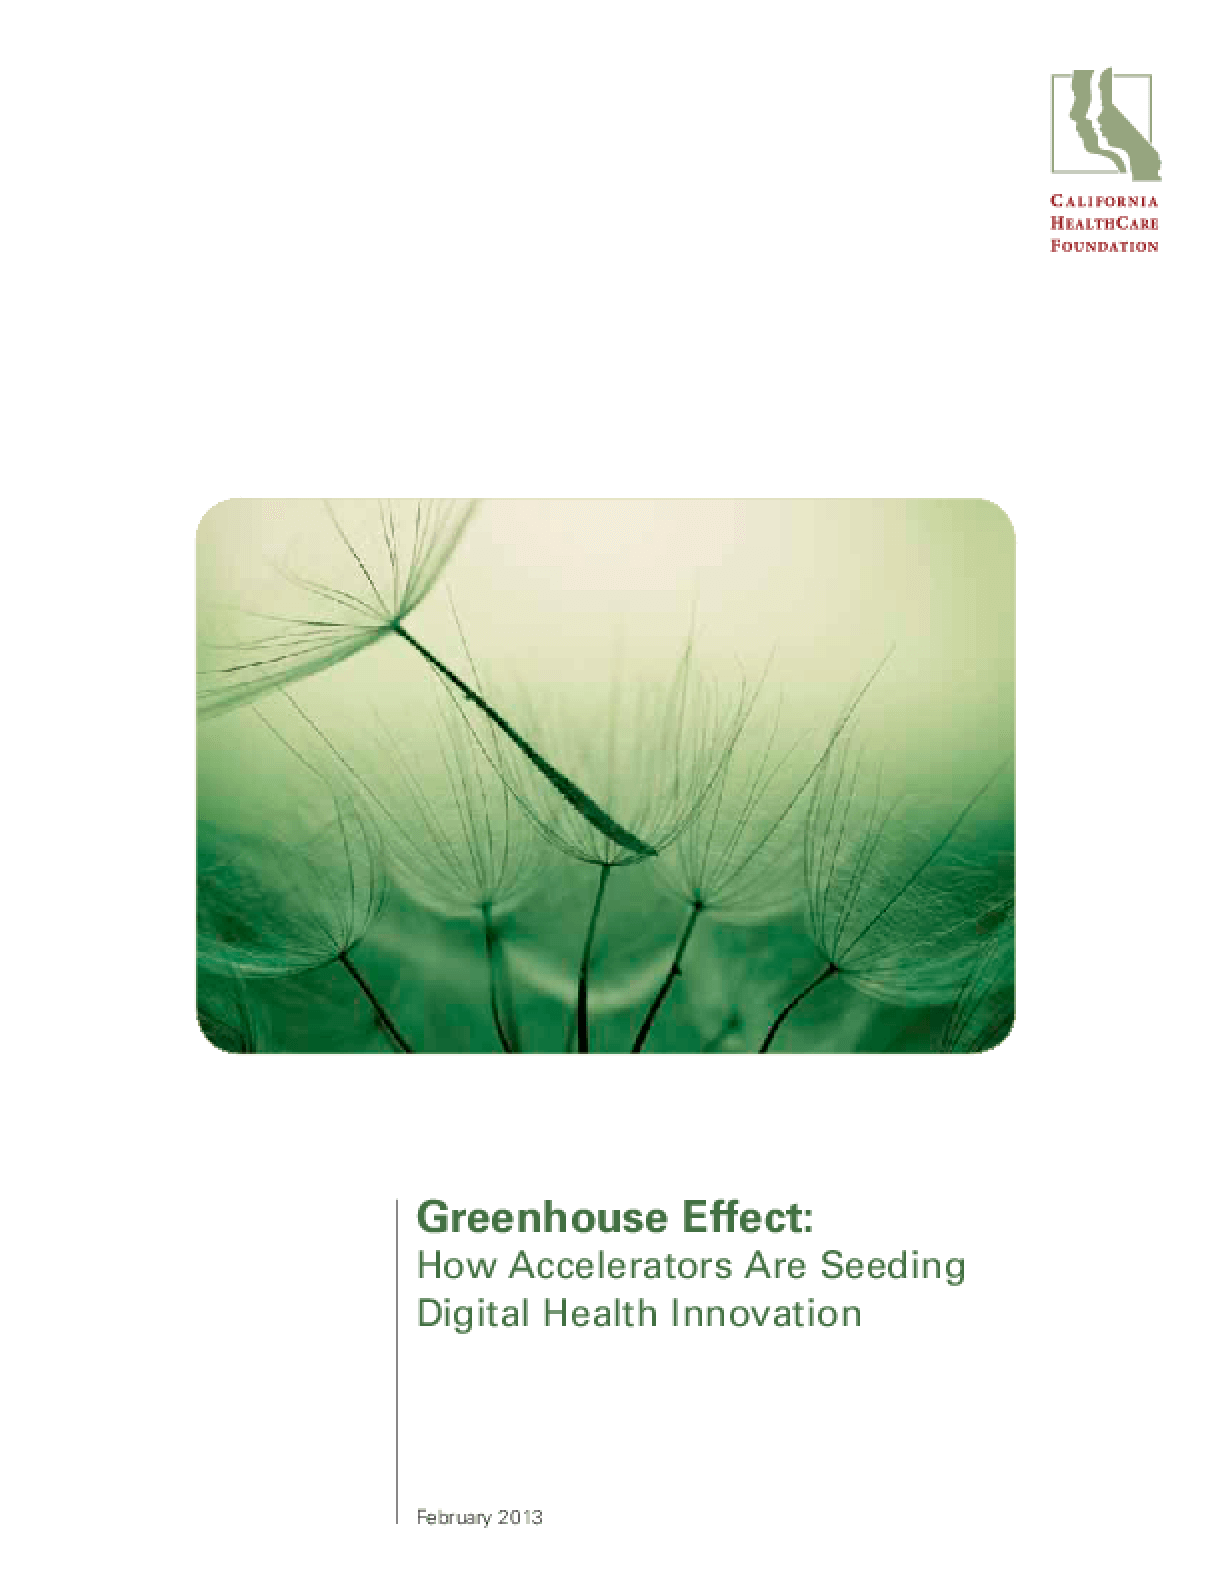 Greenhouse Effect: How Accelerators Are Seeding Digital Health Innovation